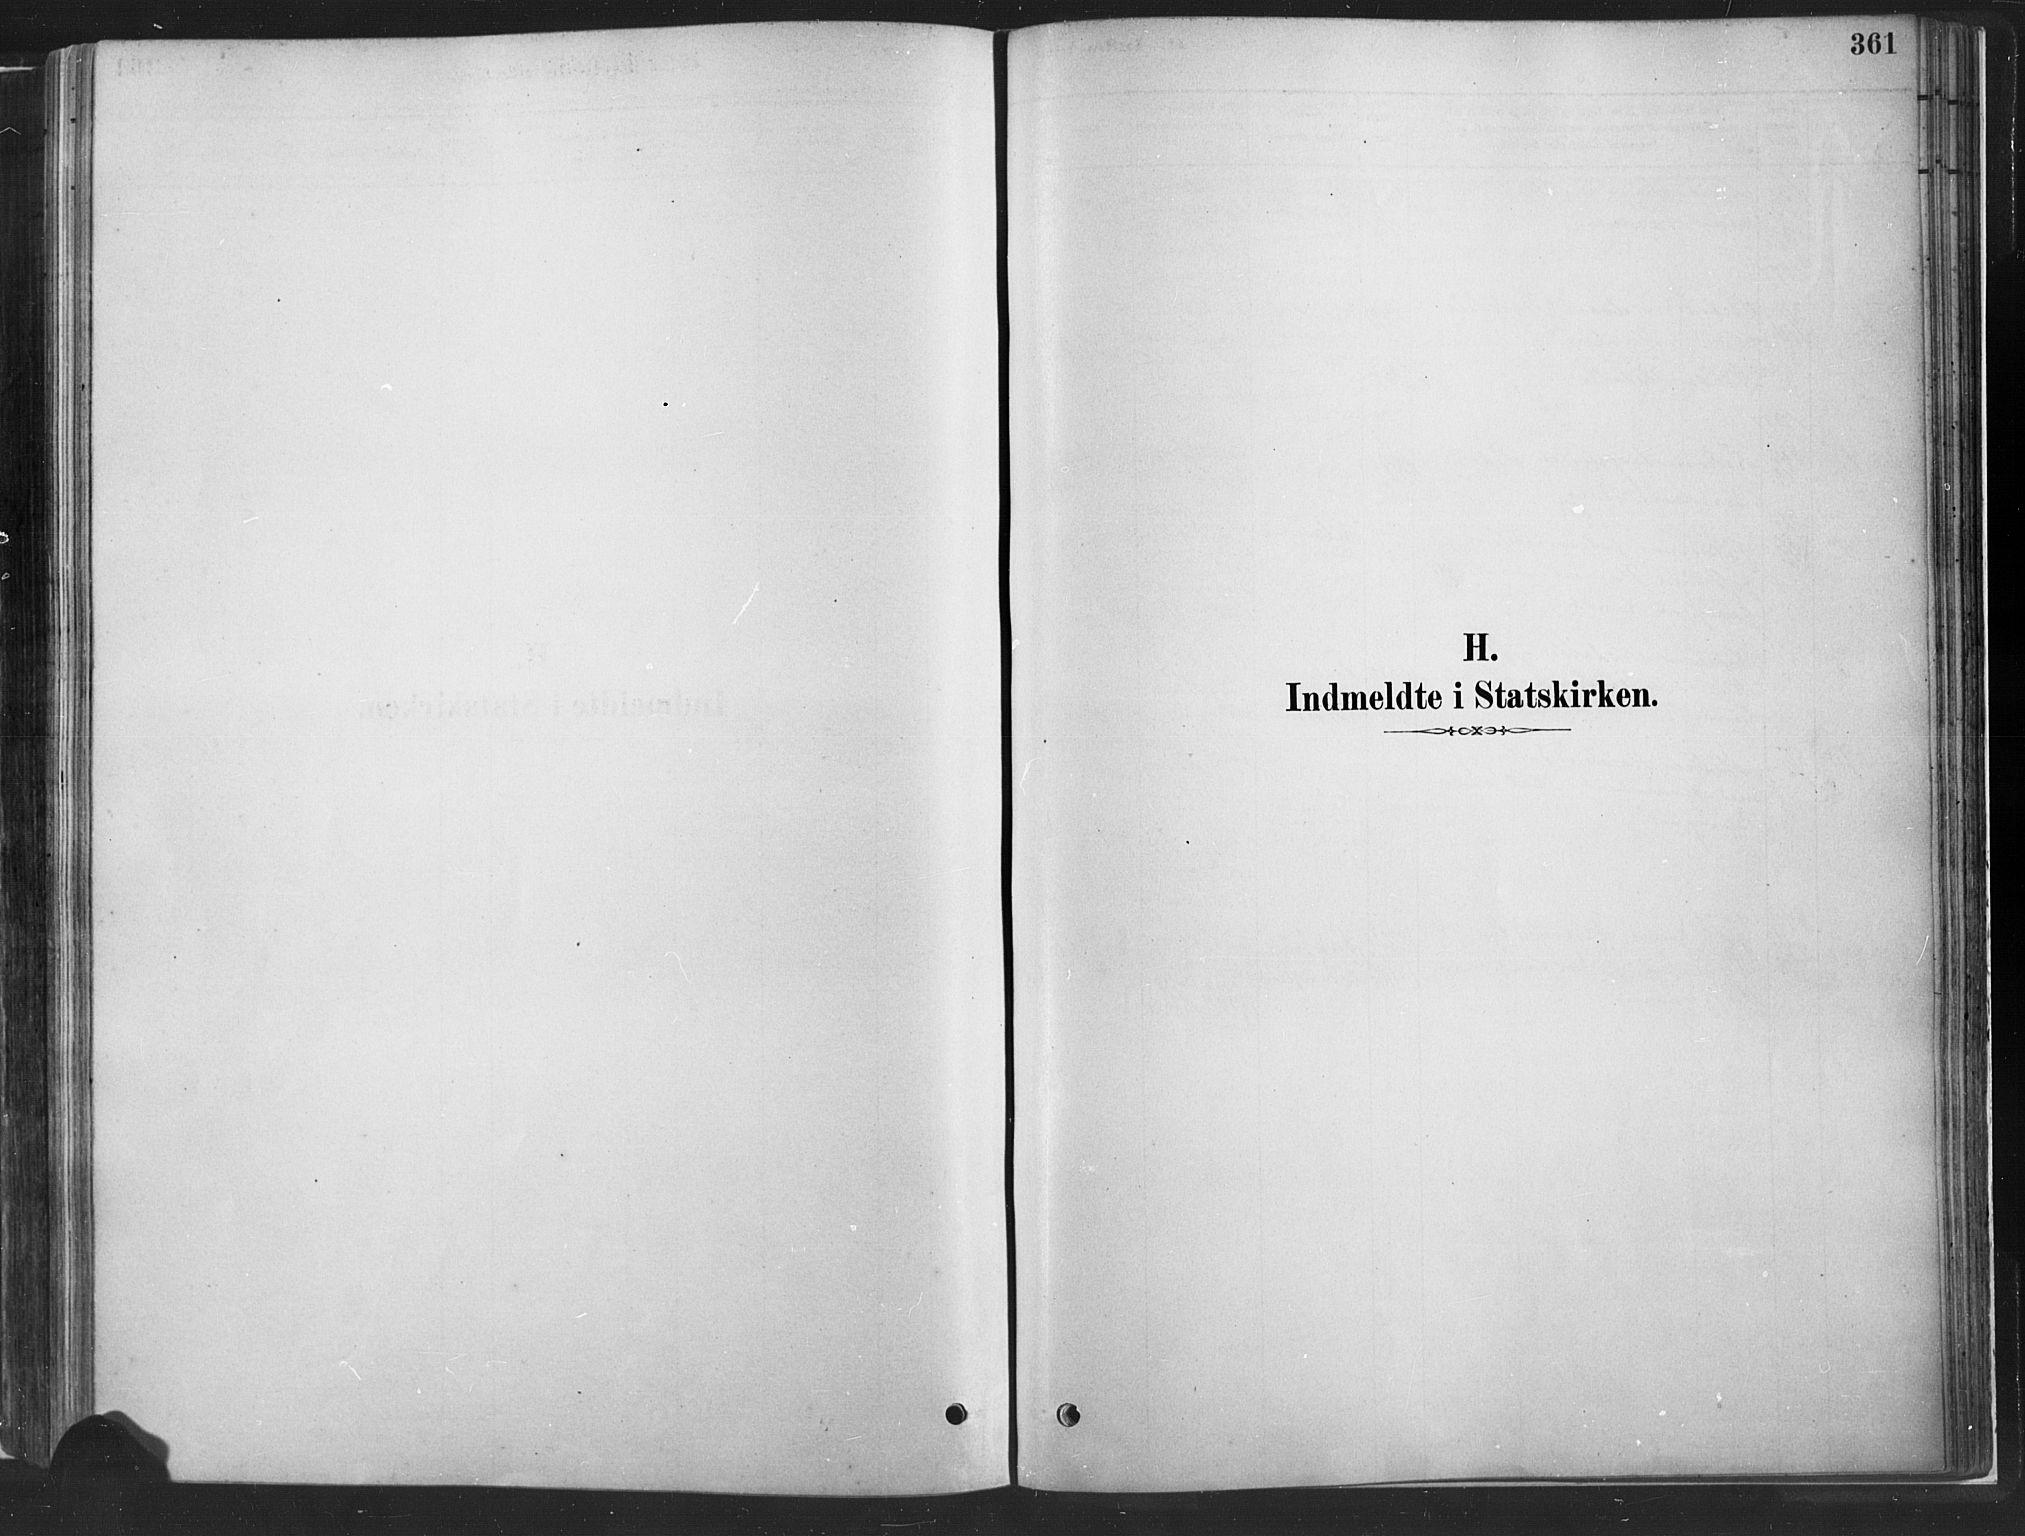 SAH, Fåberg prestekontor, H/Ha/Haa/L0010: Parish register (official) no. 10, 1879-1900, p. 361